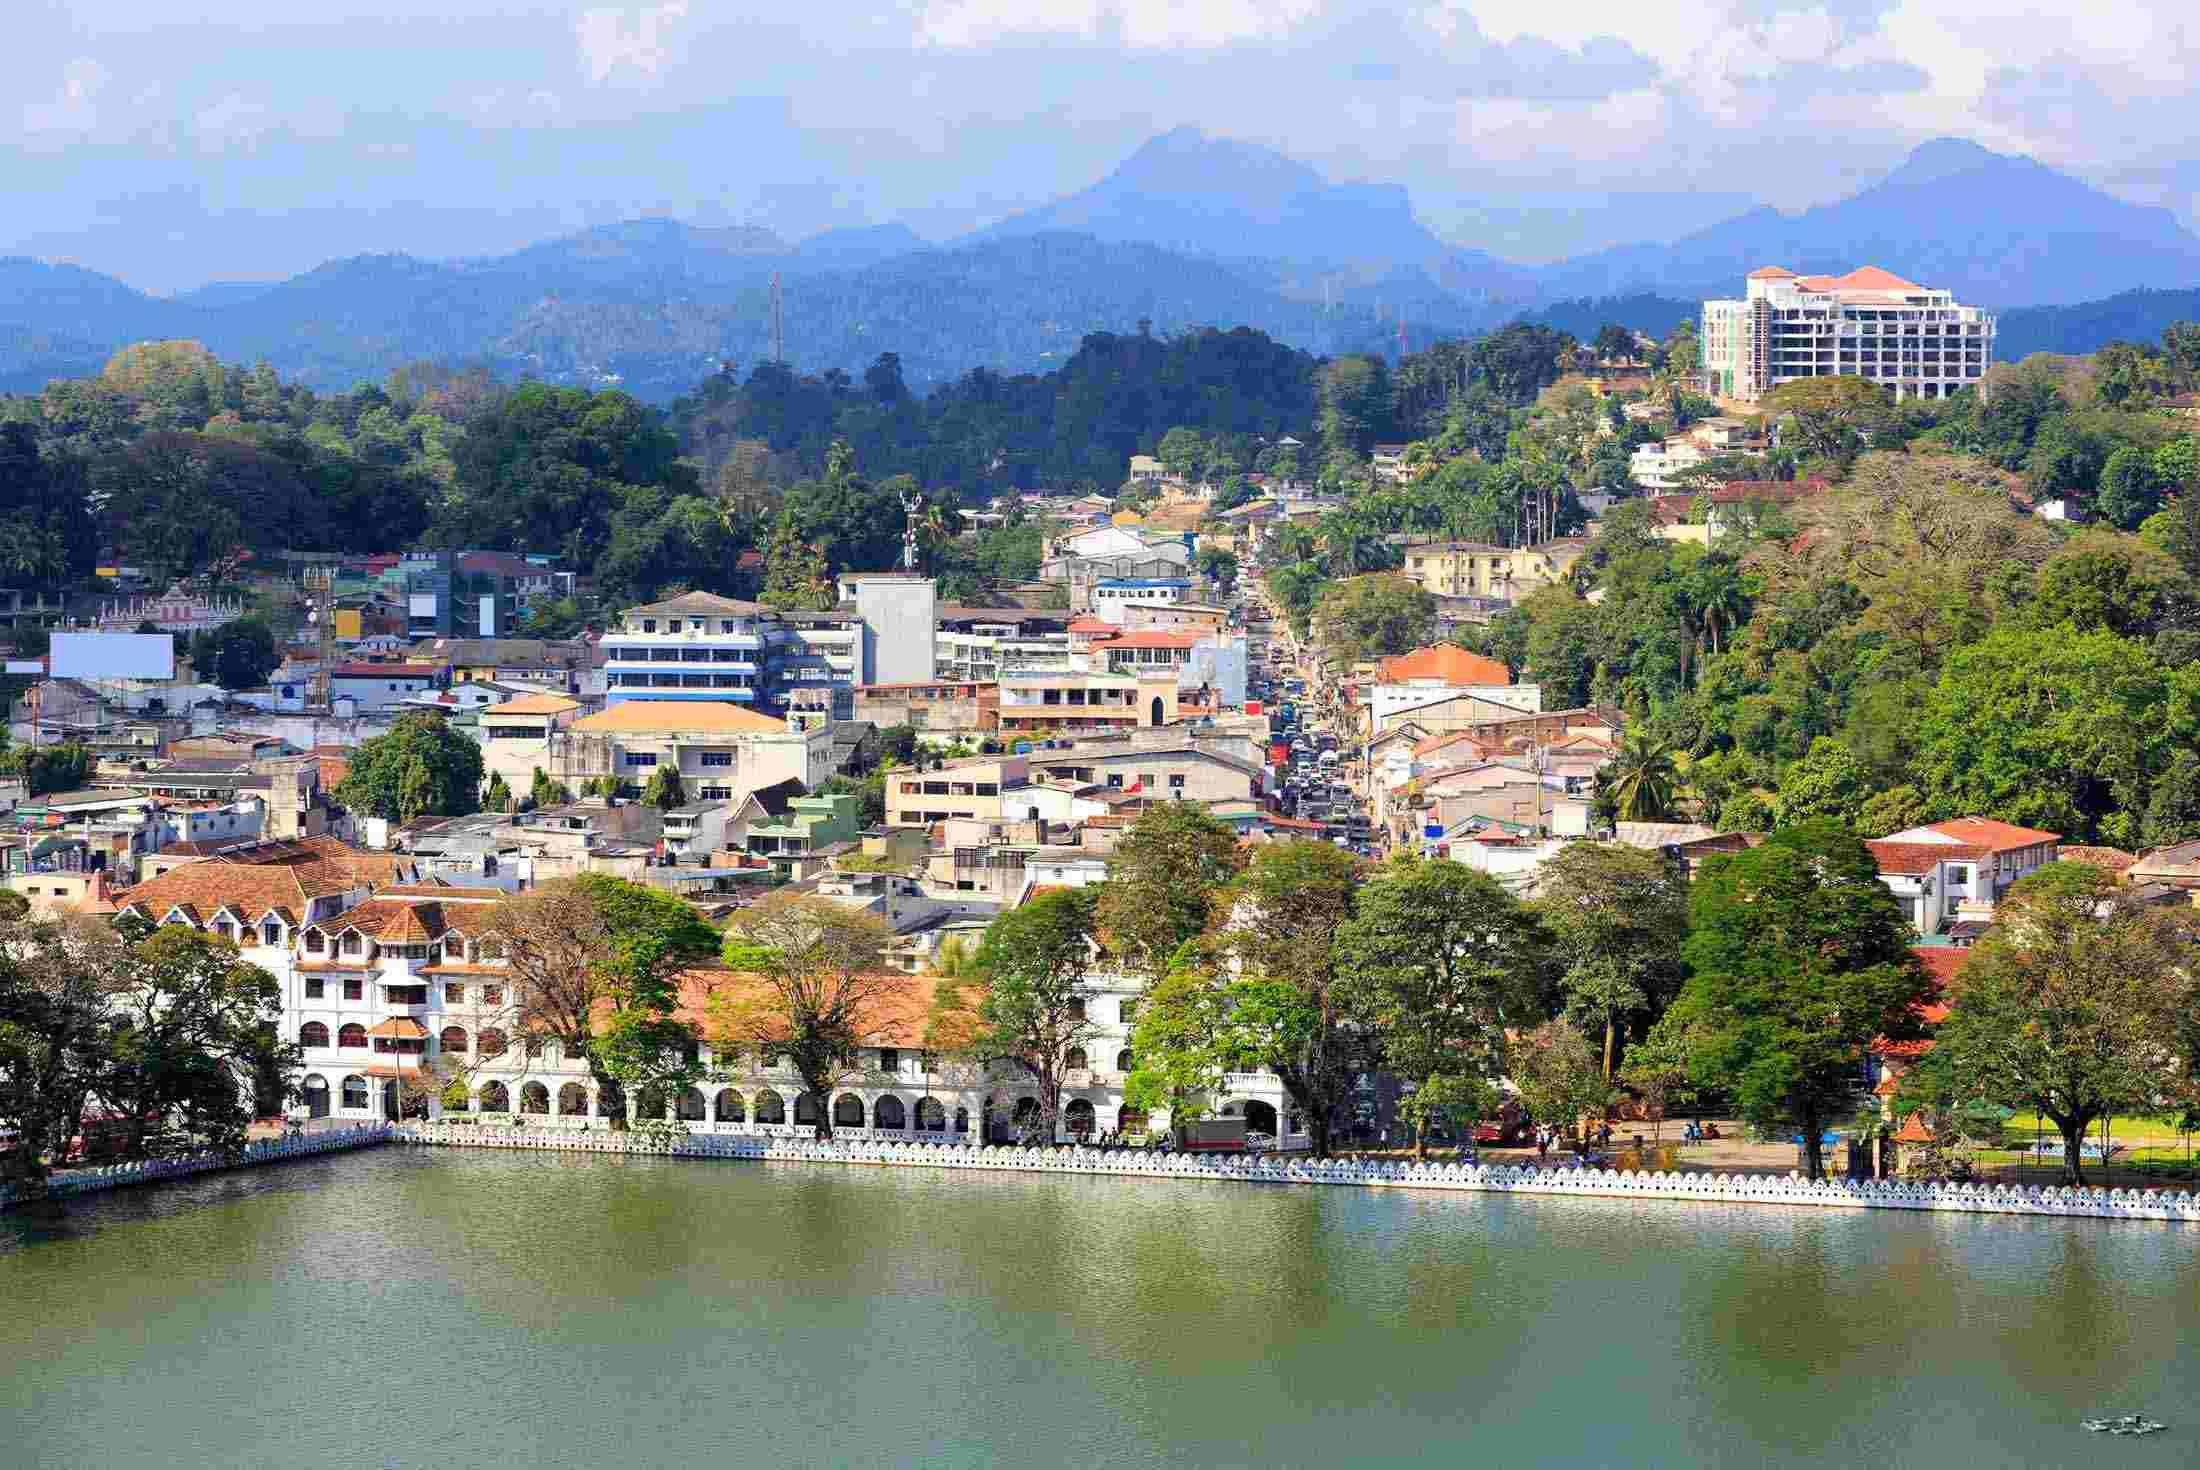 Kandy se refleja en el lago